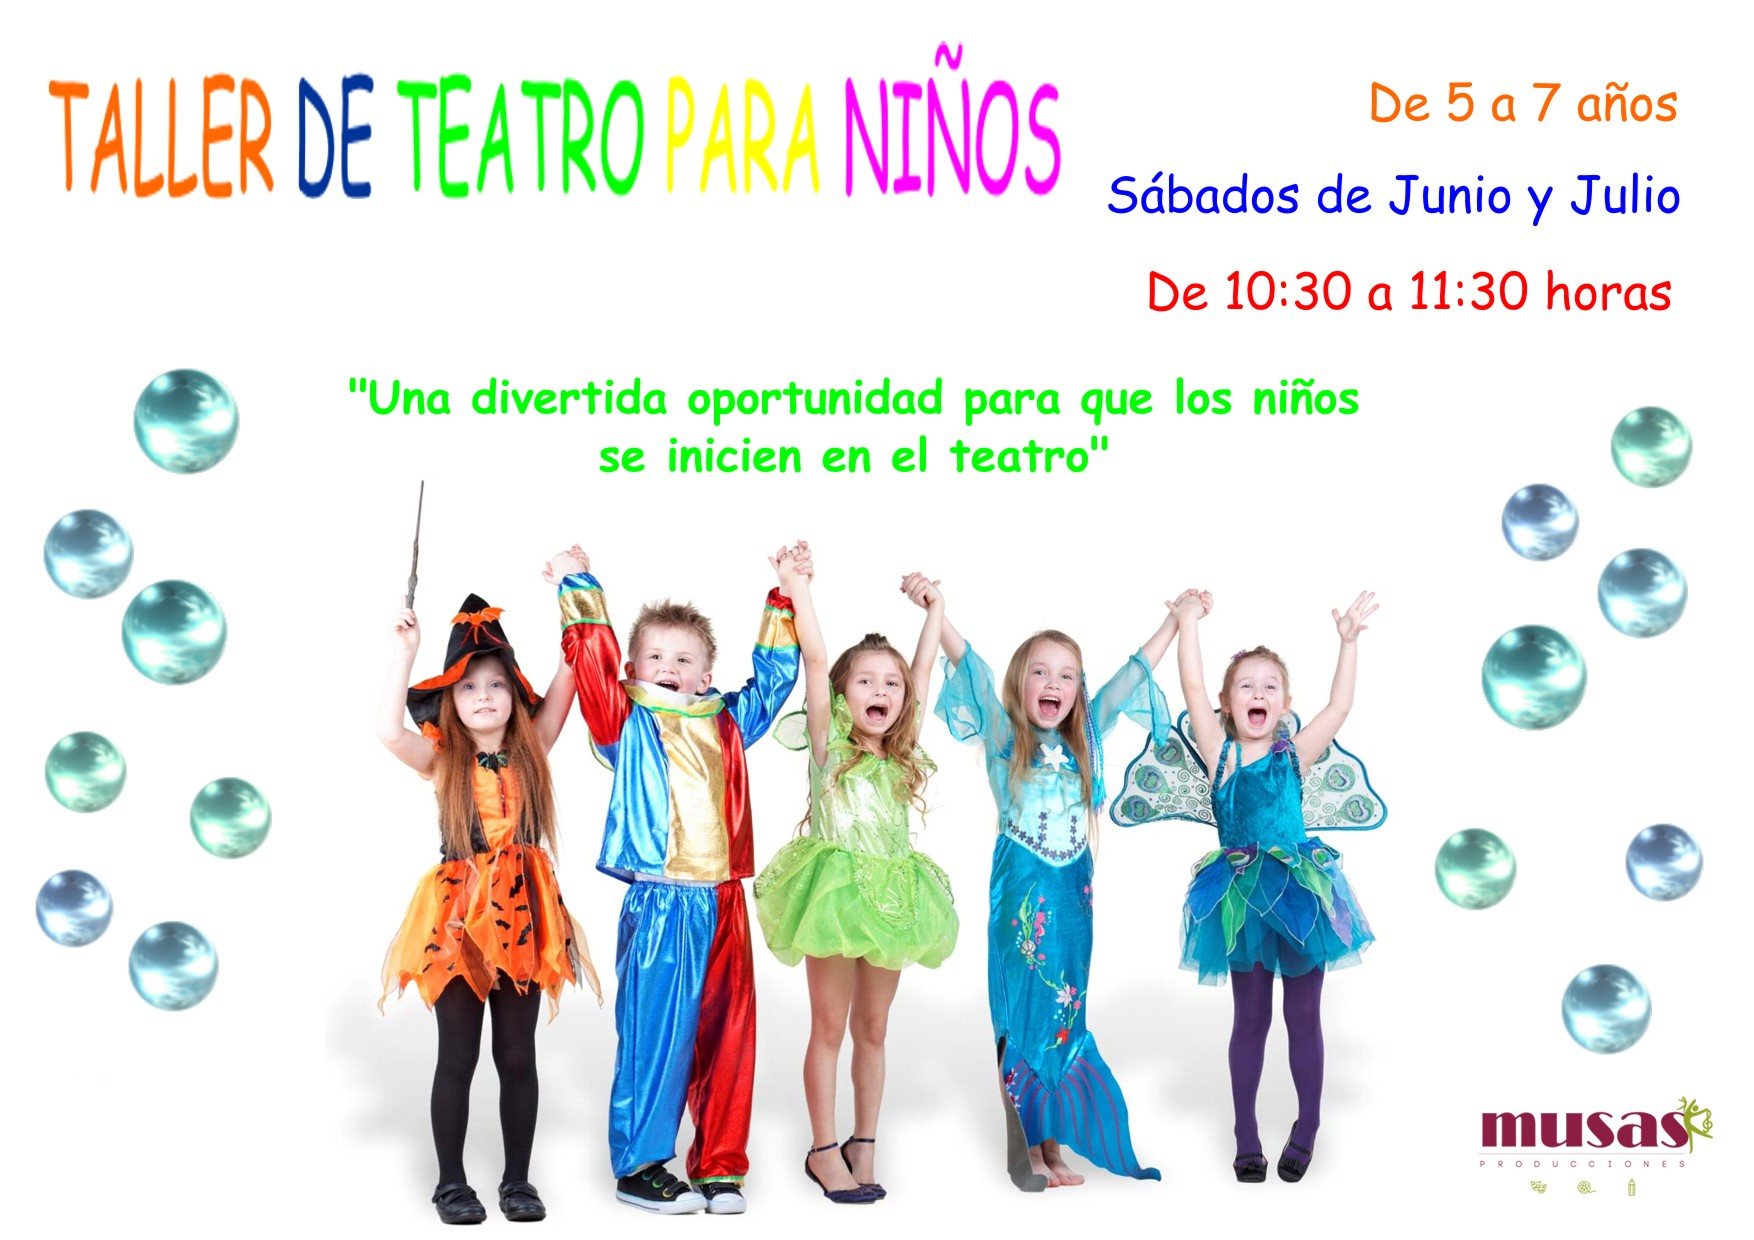 taller teatro niños